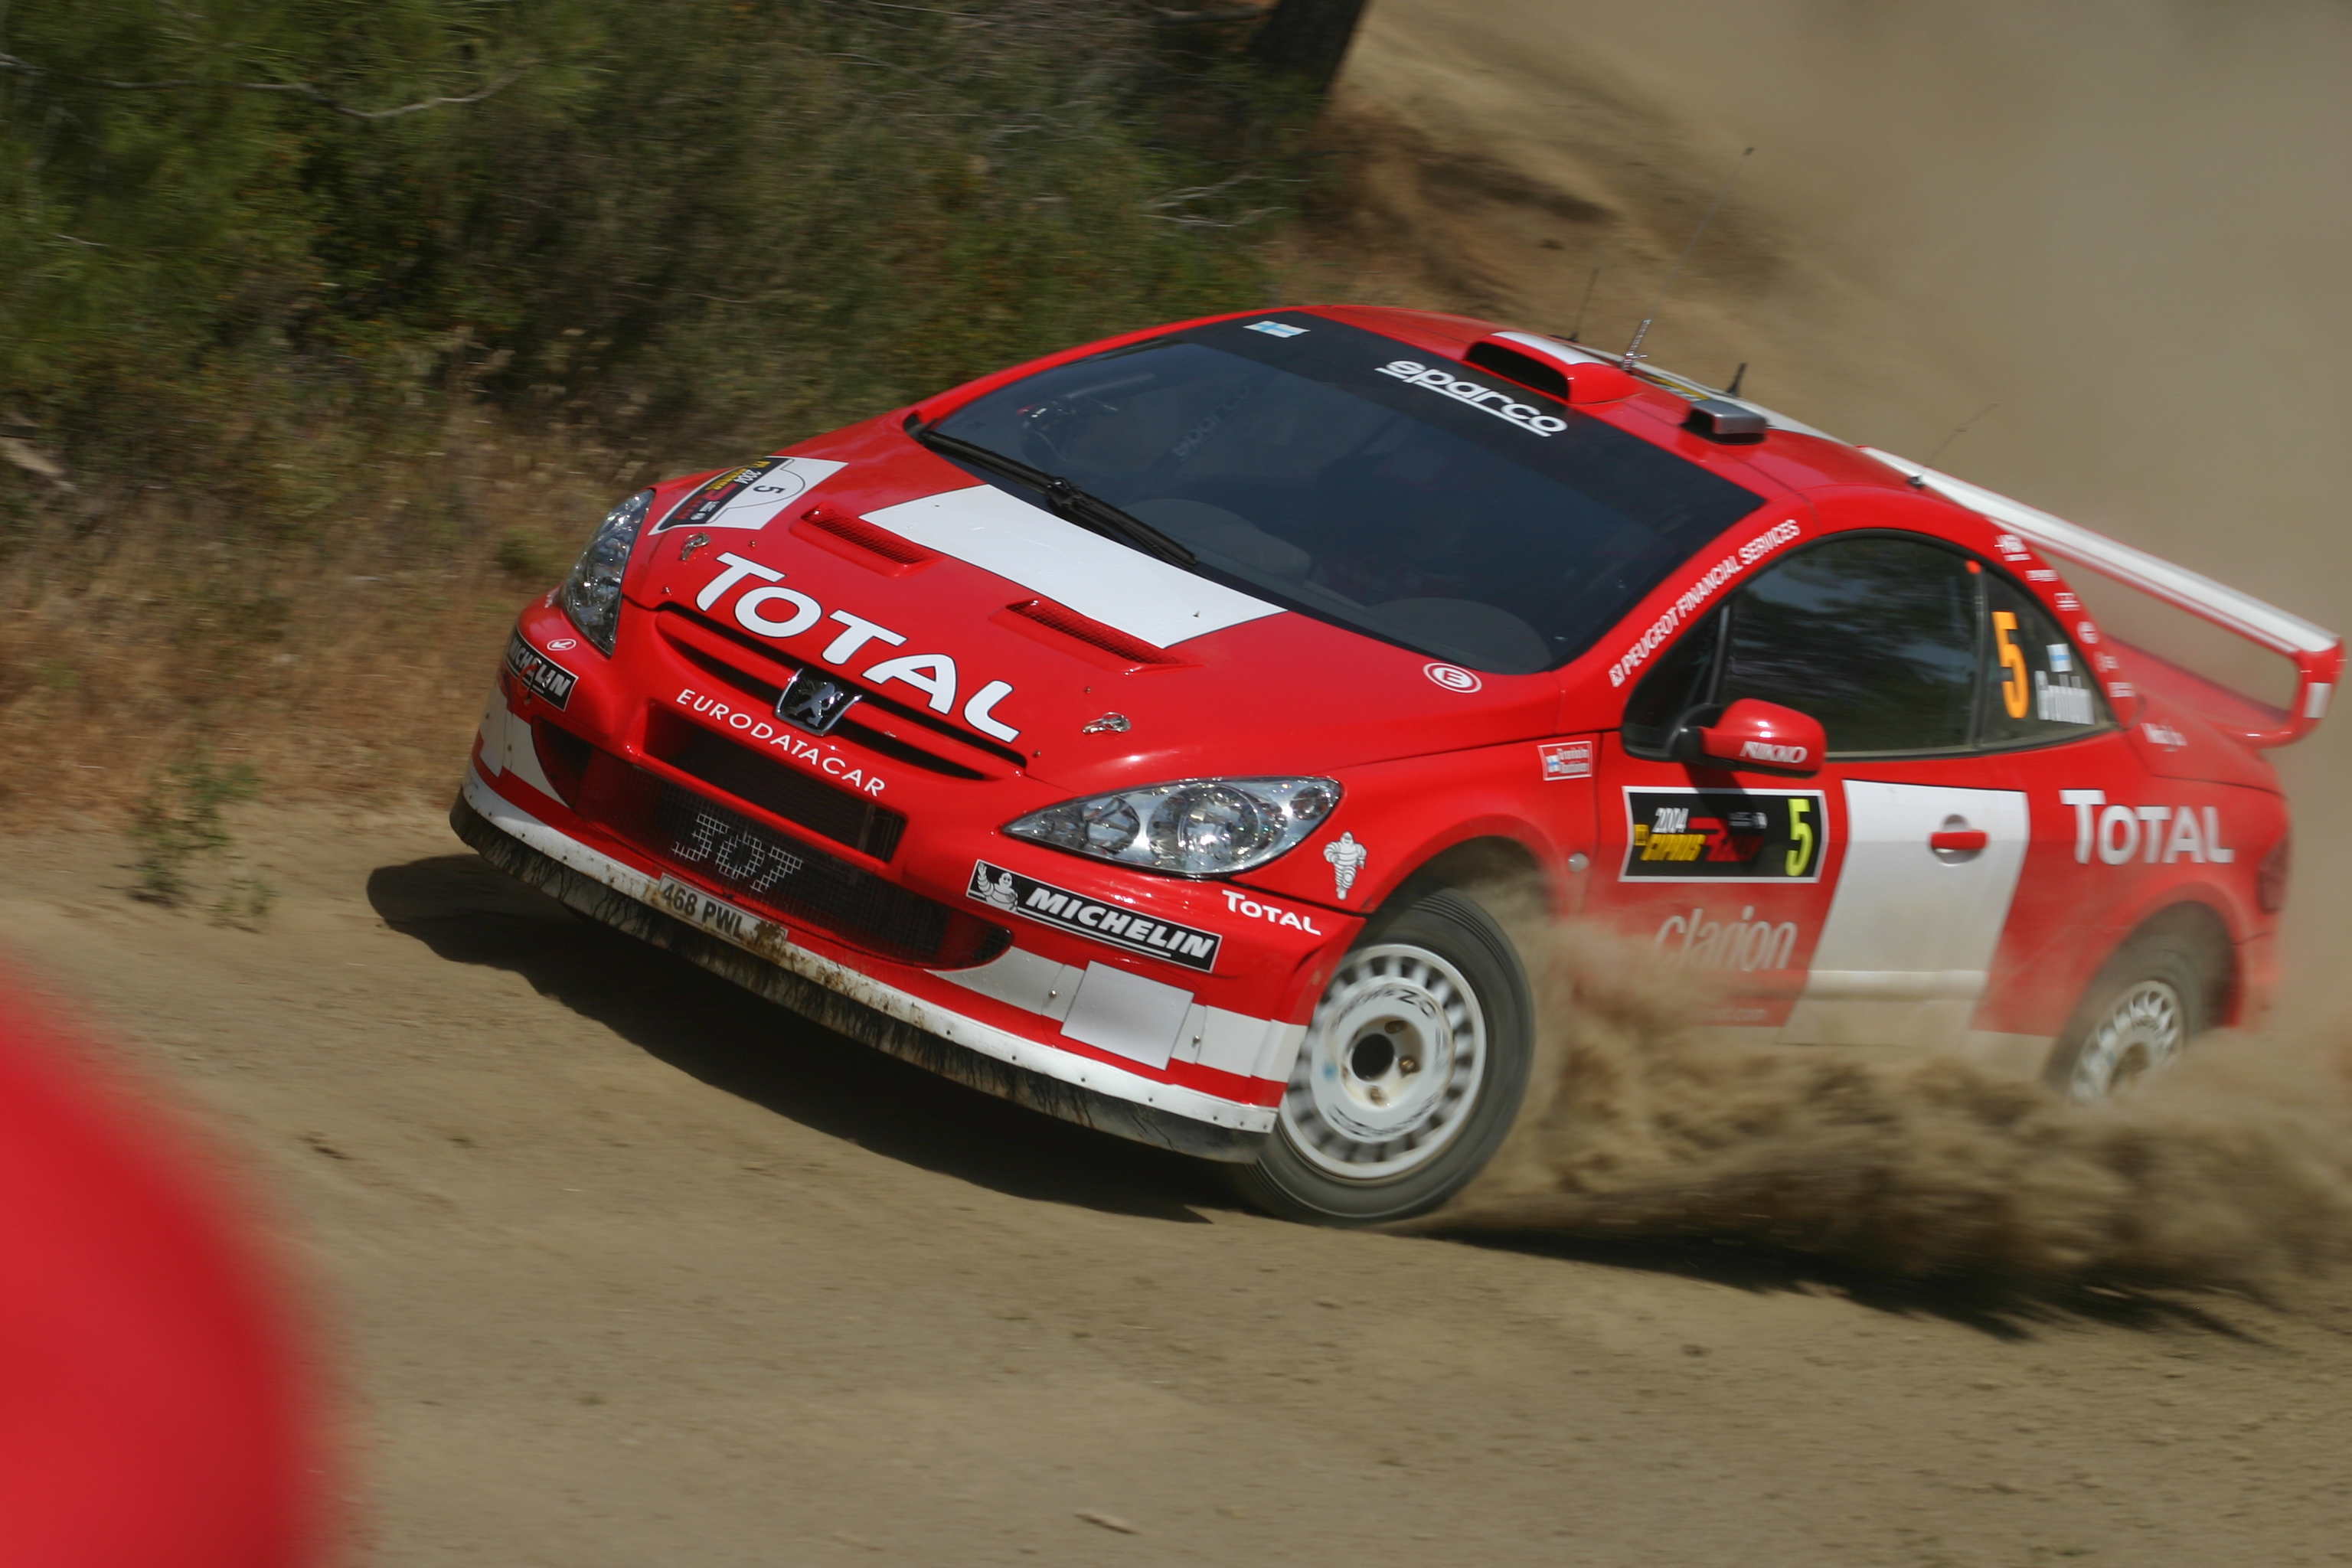 File:Marcus Grönholm - 2004 Cyprus Rally.jpg - Wikimedia Commons